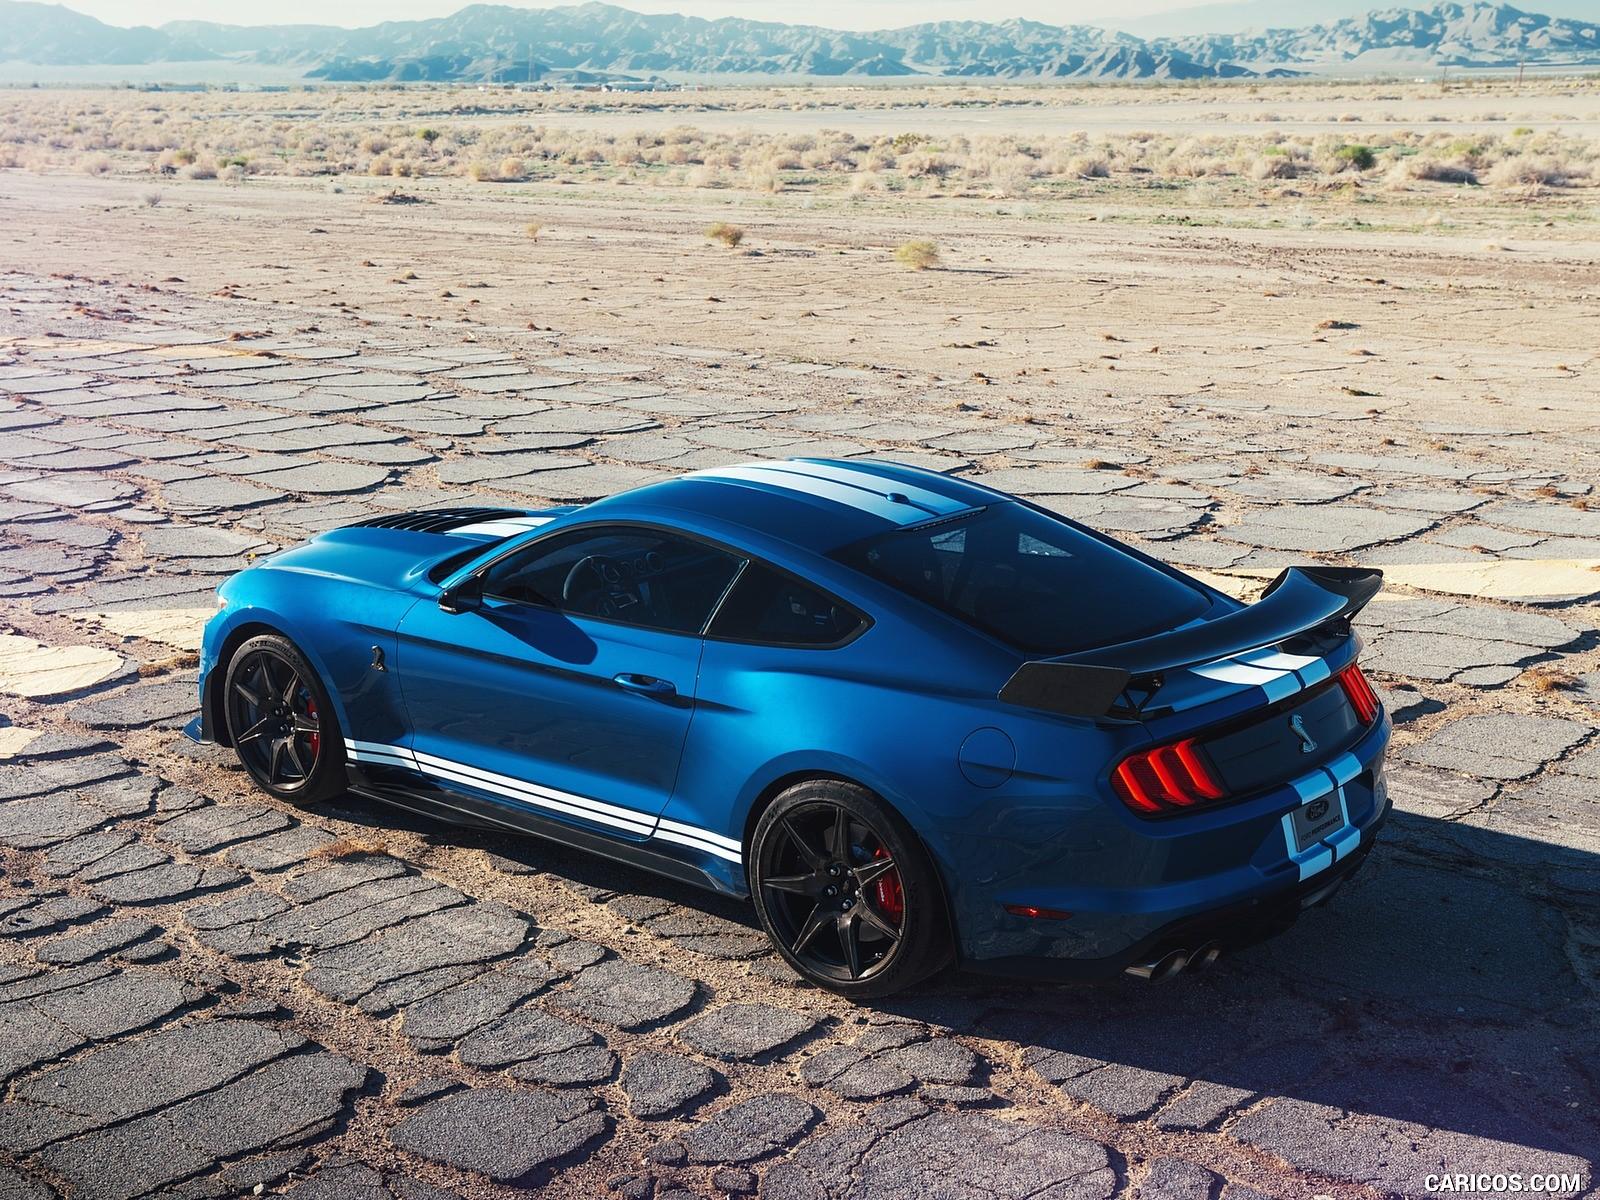 Ford Mustang Shelby duvarkağıtları 1